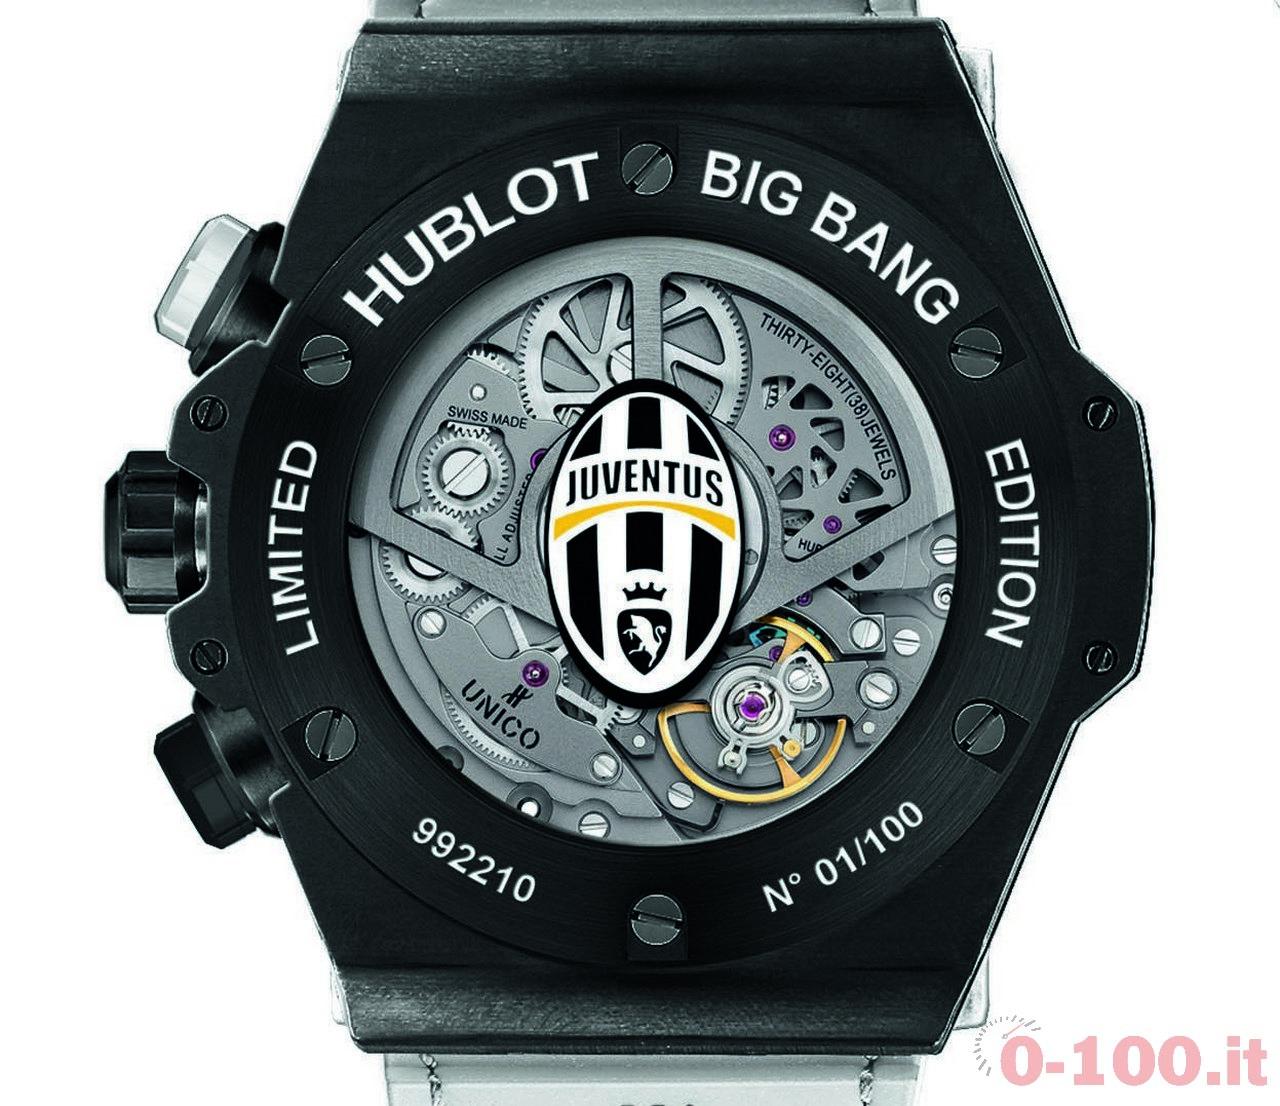 hublot-big-bang-unico-bi-retrograde-juventus-prezzo-price_0-1006